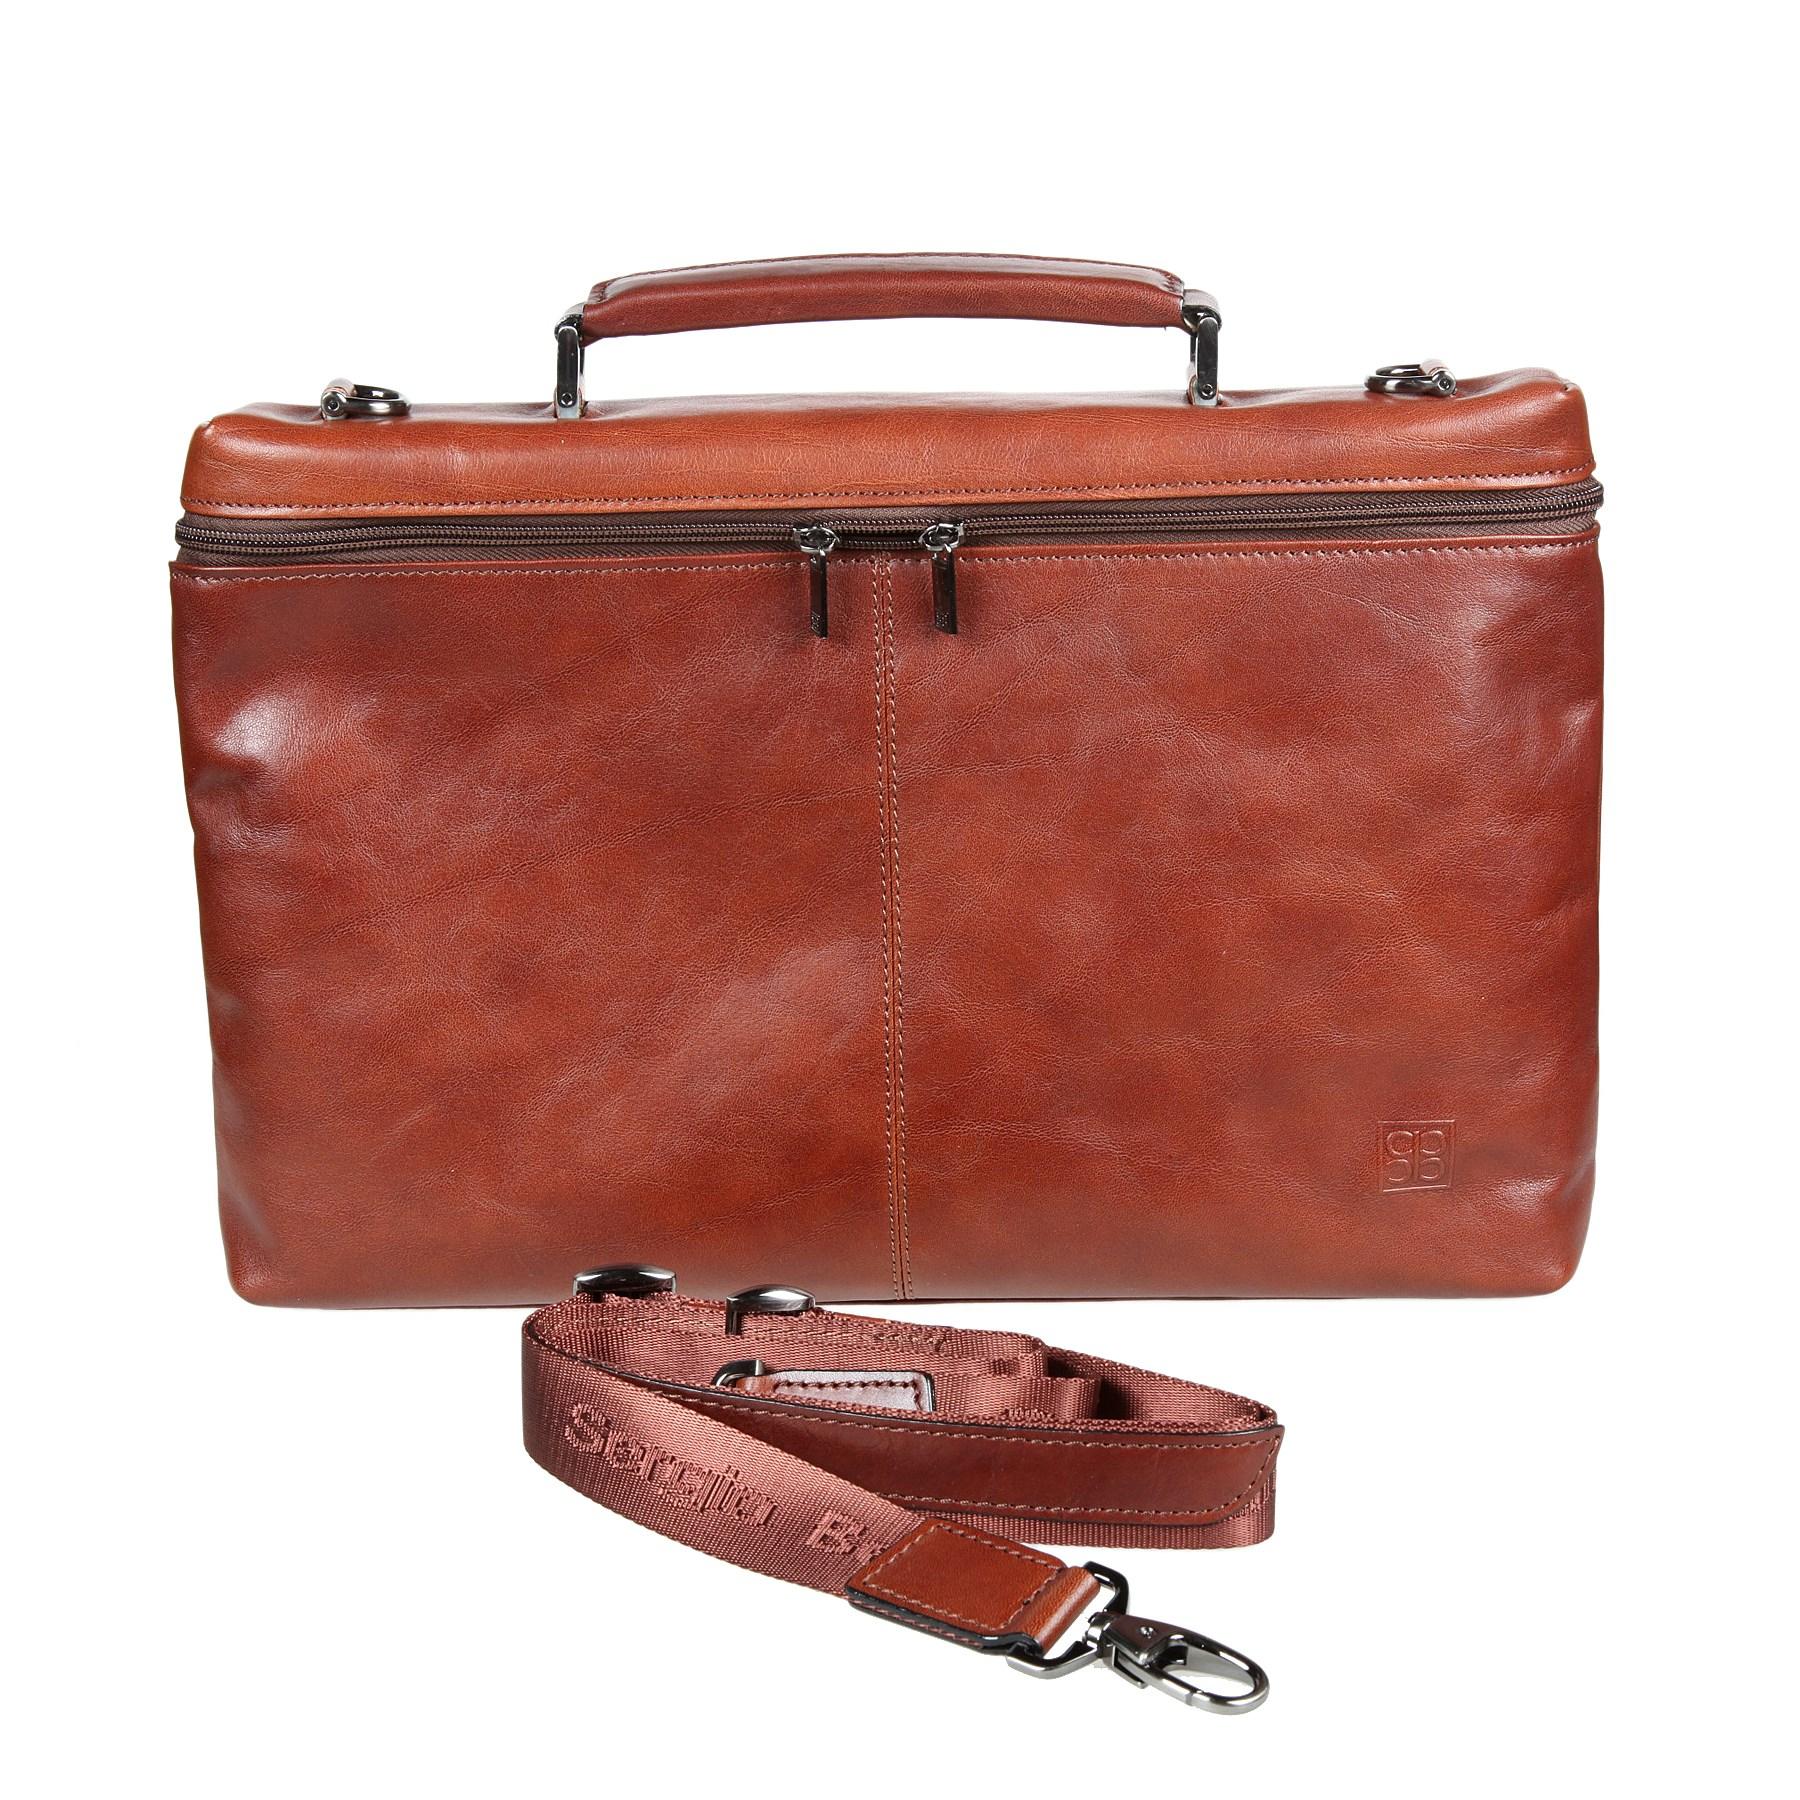 f964f9393d10 Кожаный портфель Sergio Belotti 9308 milano brown | Подарки.ру